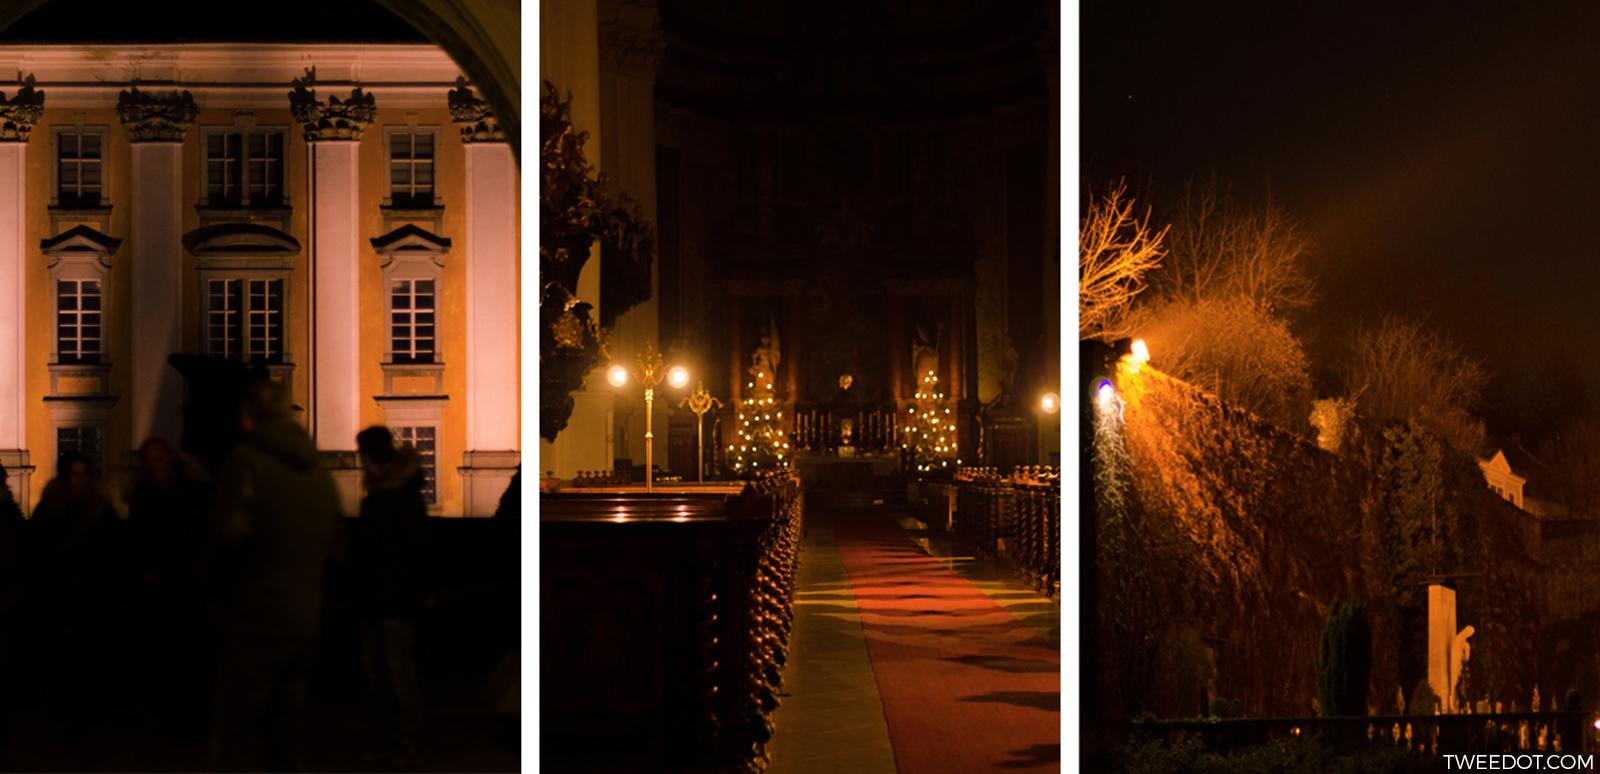 Tweedot - Austria Turismo. Percorsi Storici e Culturali a Linz. Abbazia di St Florian